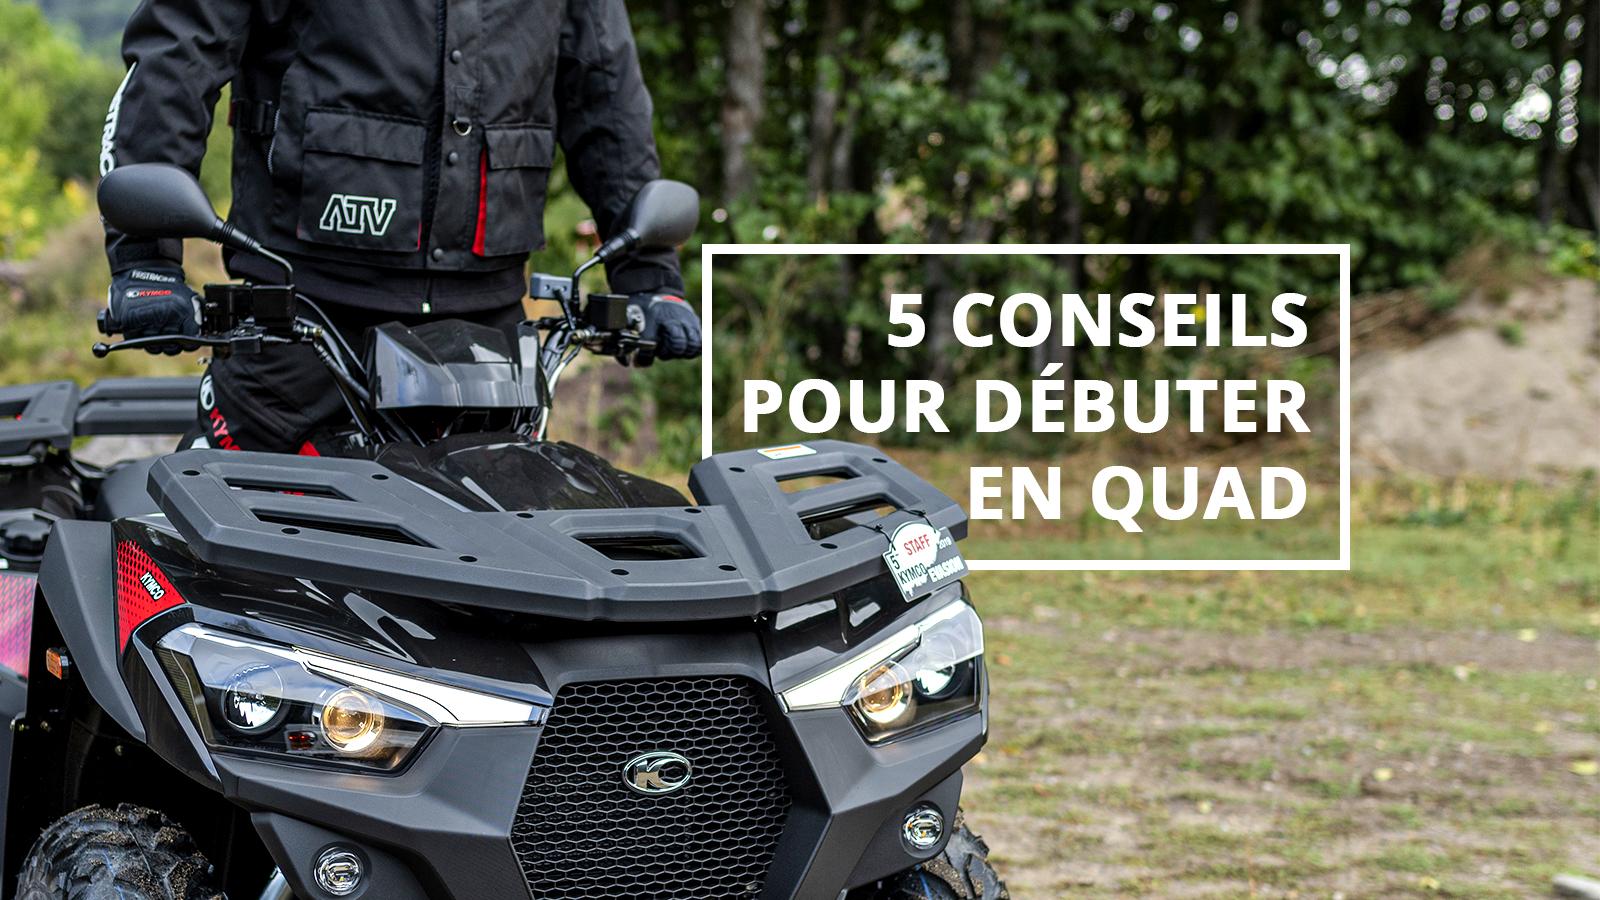 conseil-debuter-quad-featured